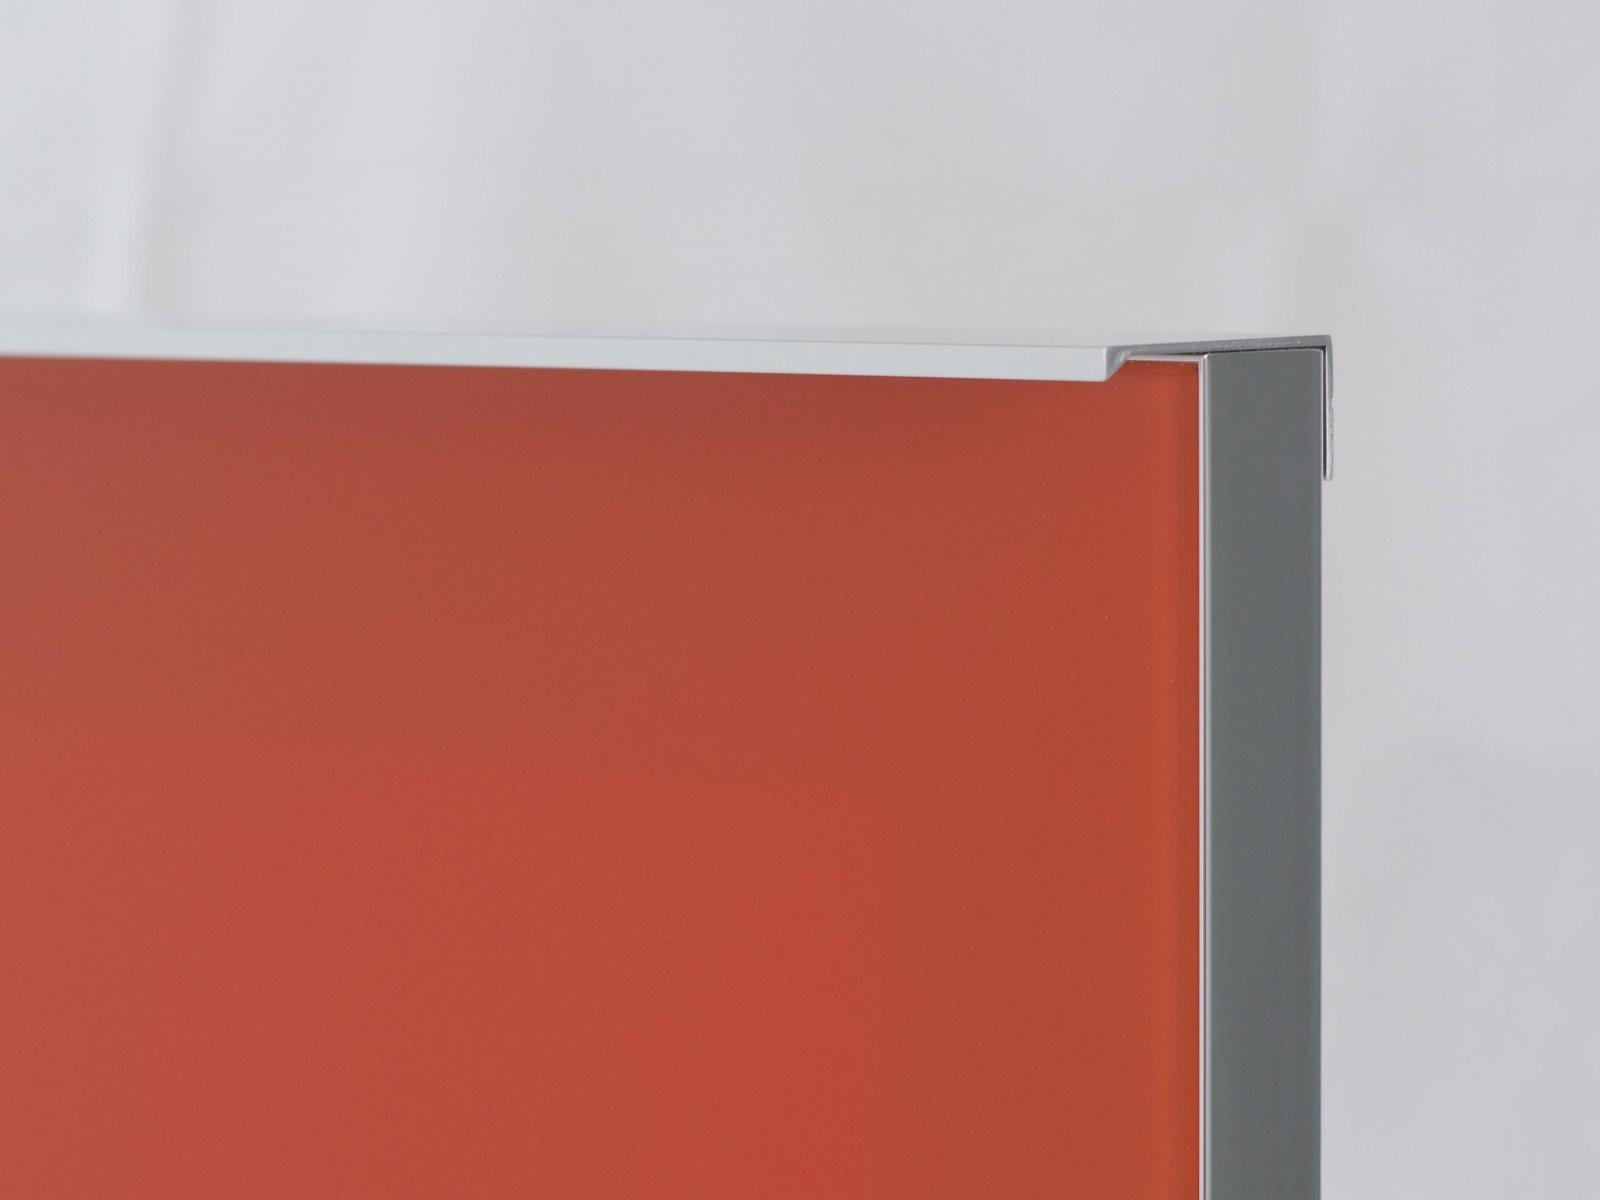 Porta-18 (Perfil V04 brilho + puxador L02 brilho + vidro lacado laranja)